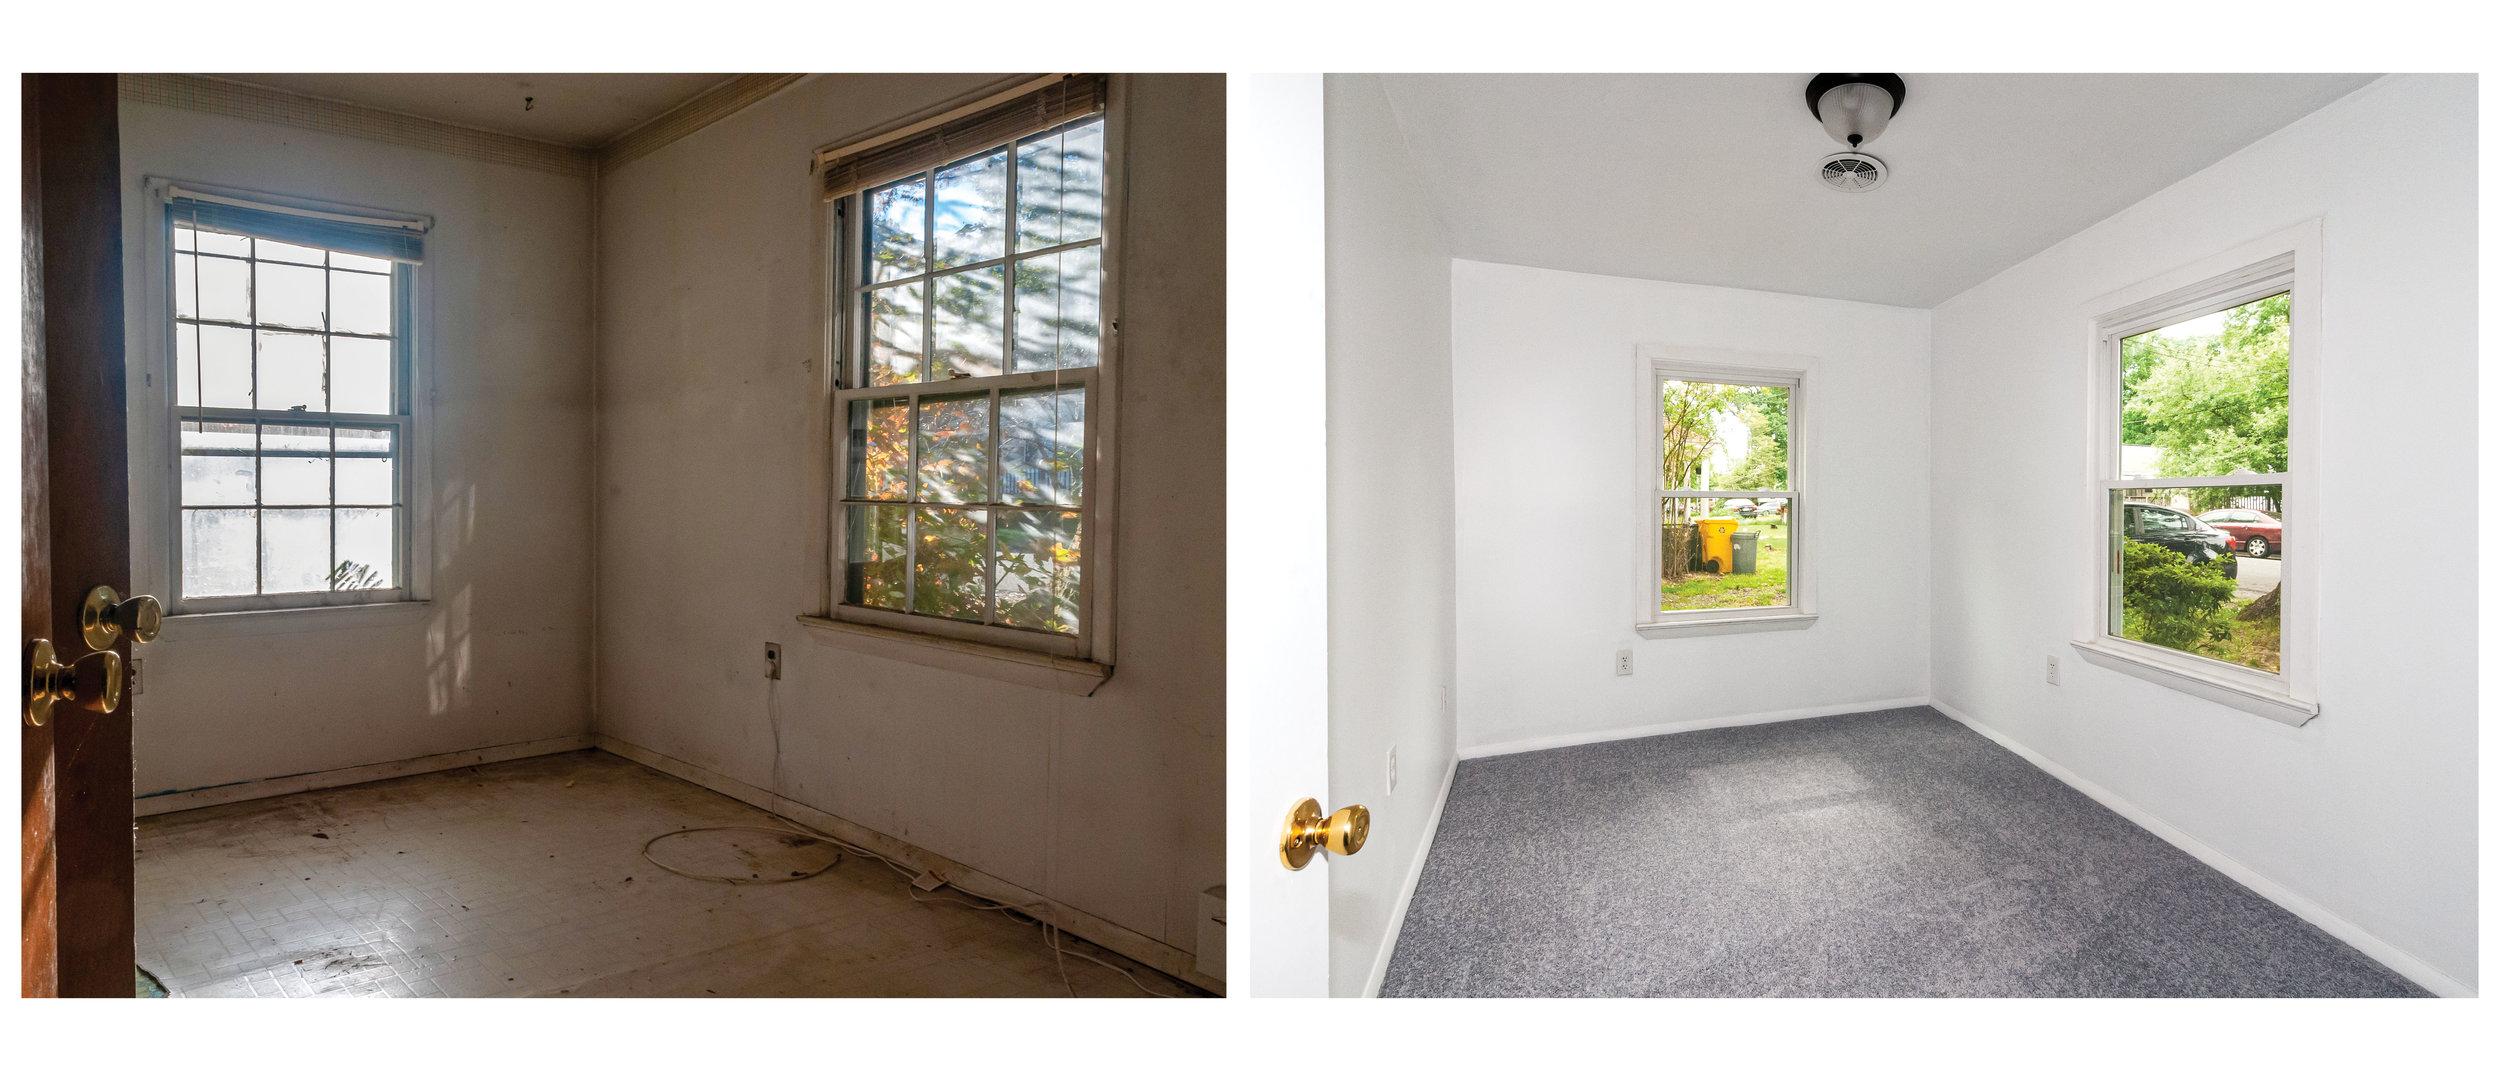 Fairmount bedroom 1 comparison.jpg